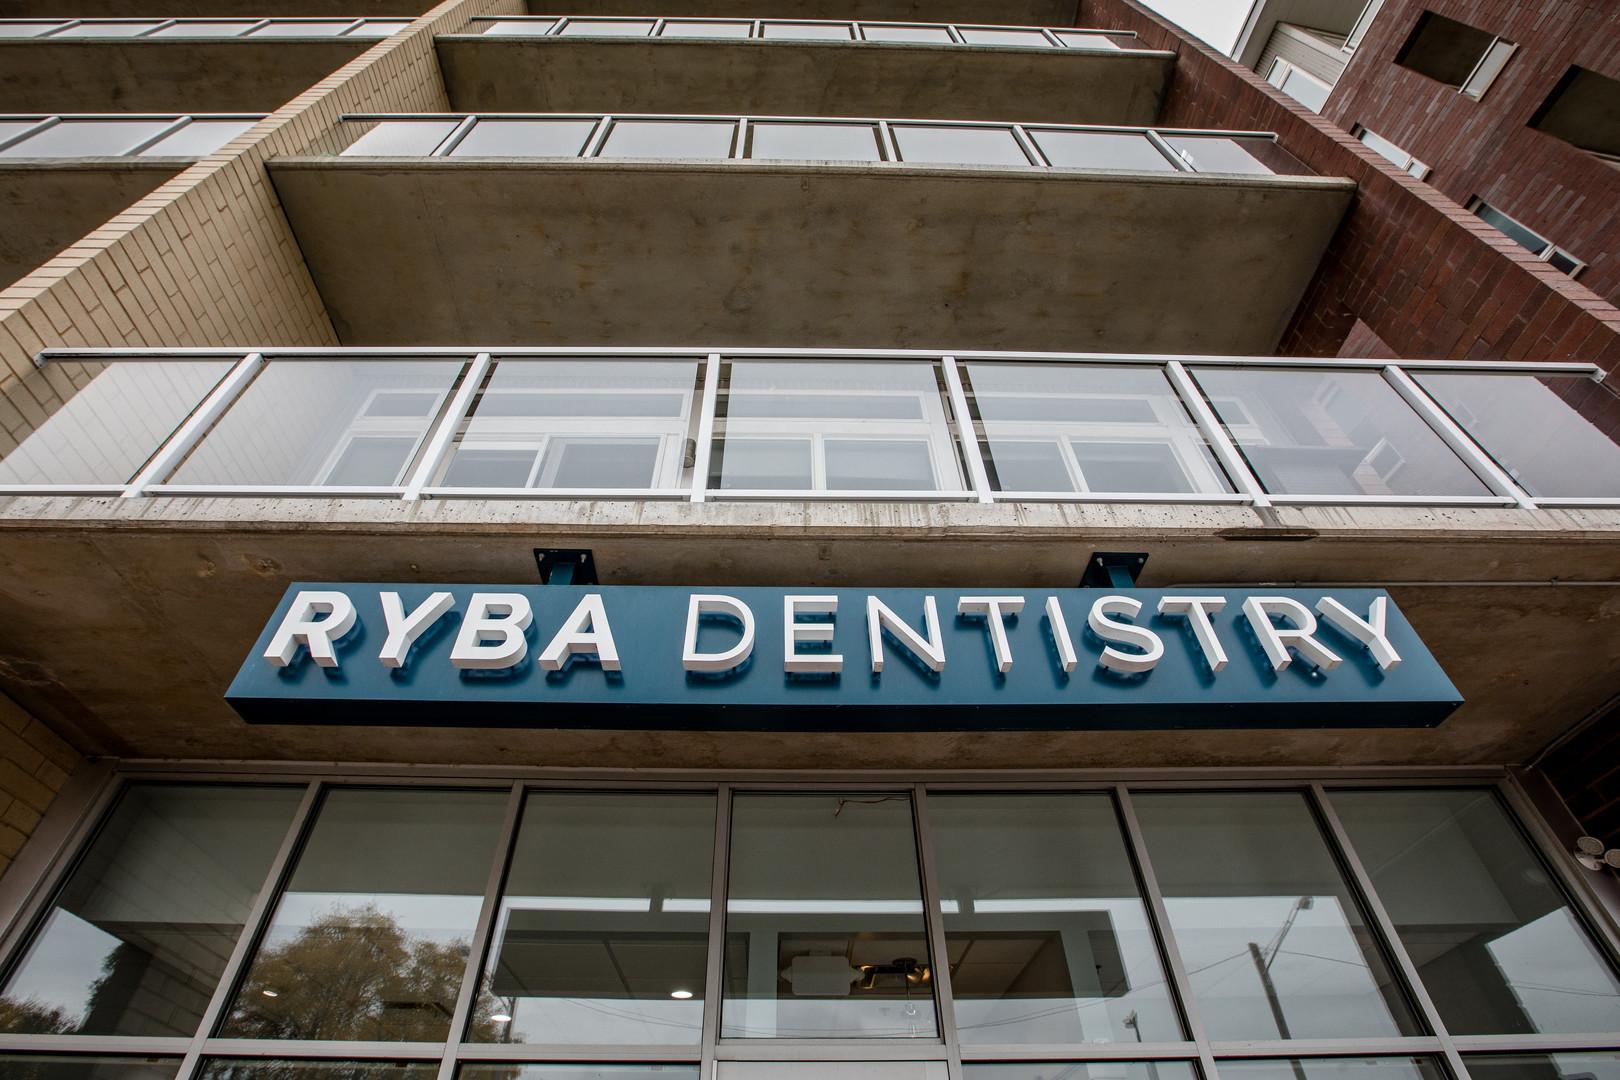 Ryba Dentistry   Exterior